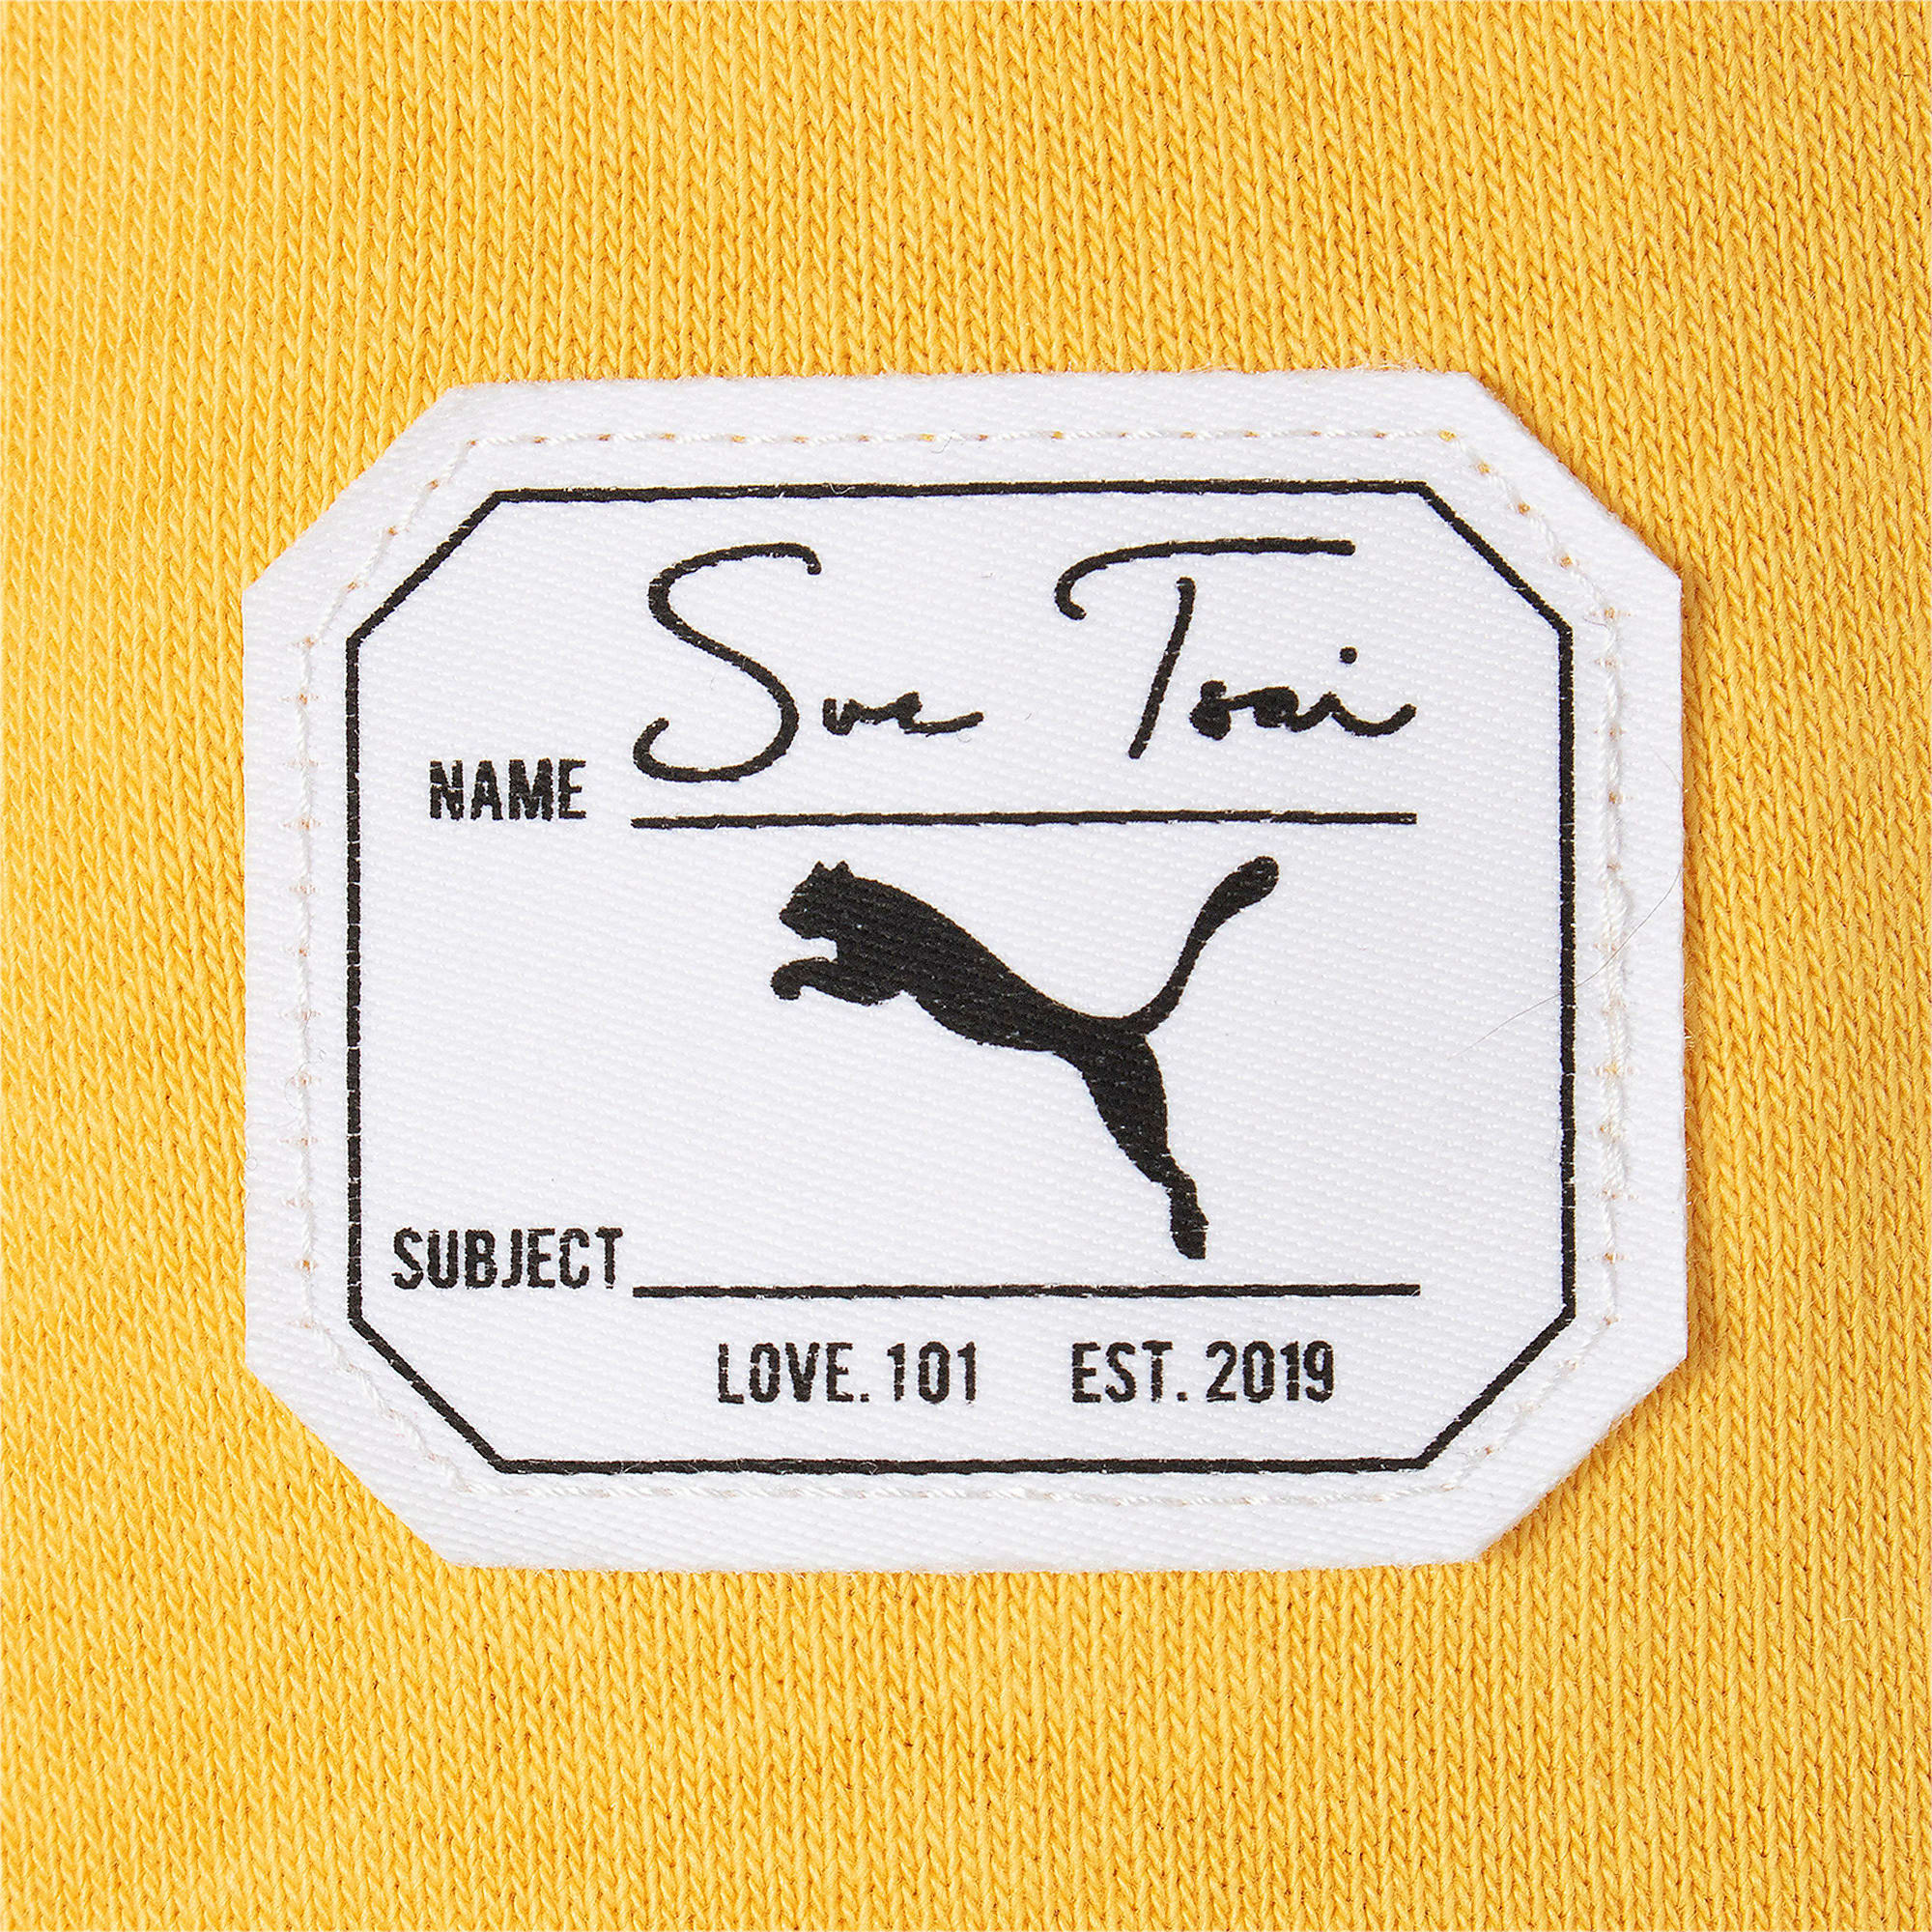 Thumbnail 4 of PUMA x SUE TSAI ウィメンズ スウェットパンツ, Daffodil, medium-JPN